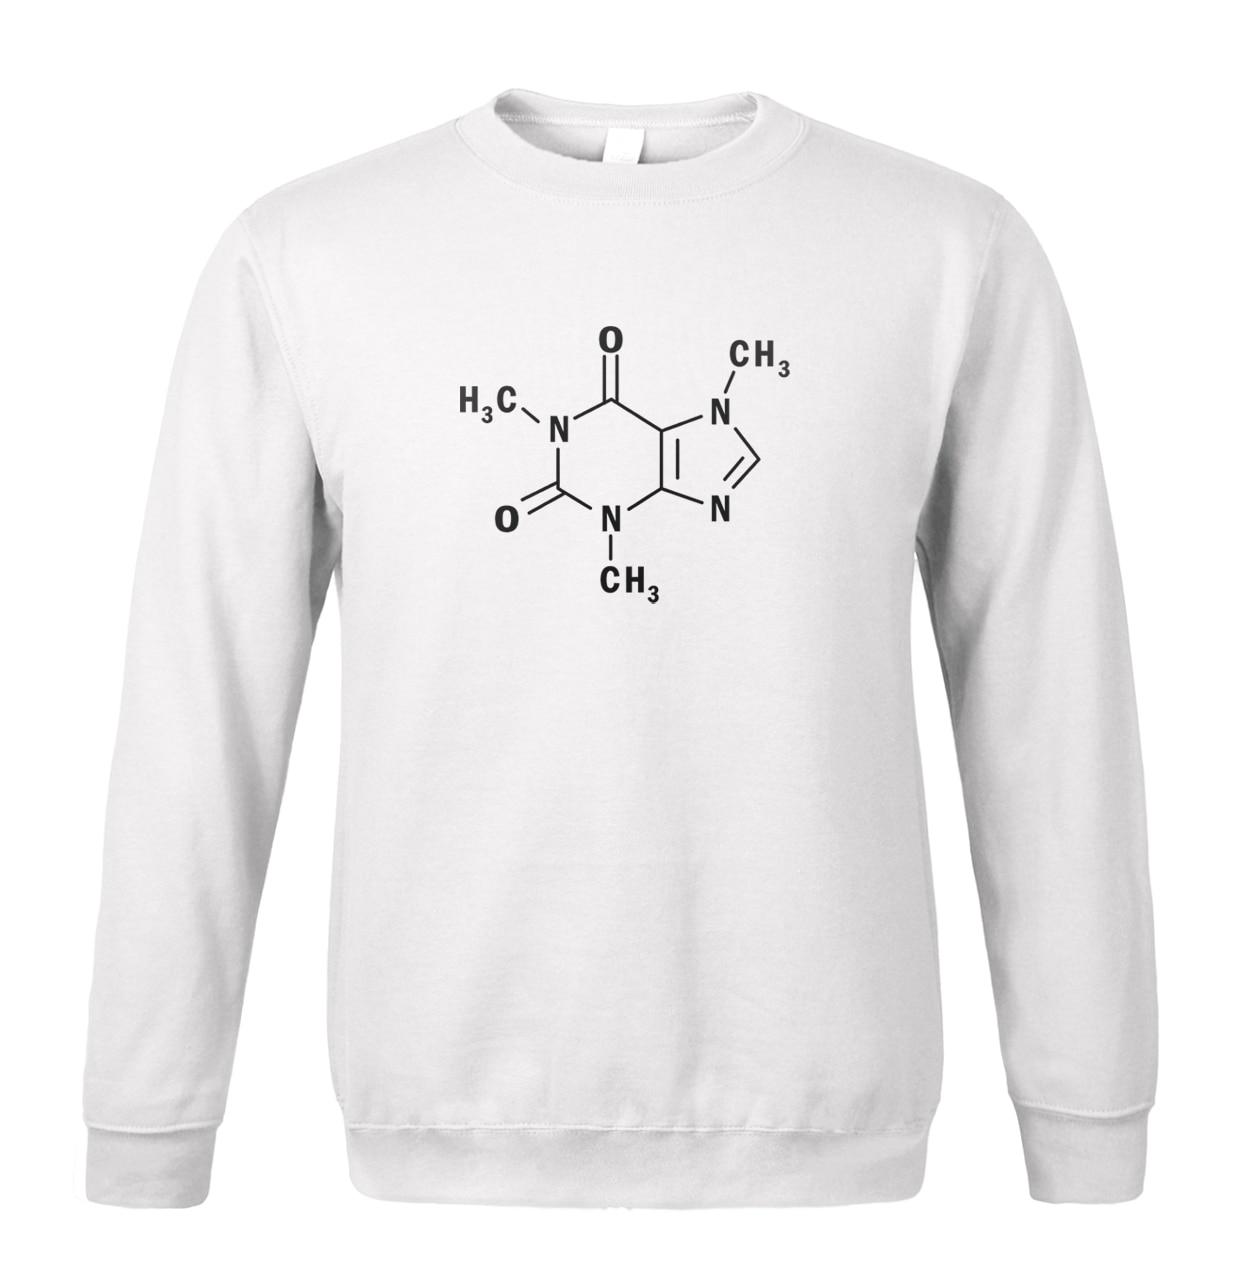 Adult Student The Big Bang Theory Sheldon Chemical molecular structure 2019 new men sweatshirt spring winter fashion men hoodie